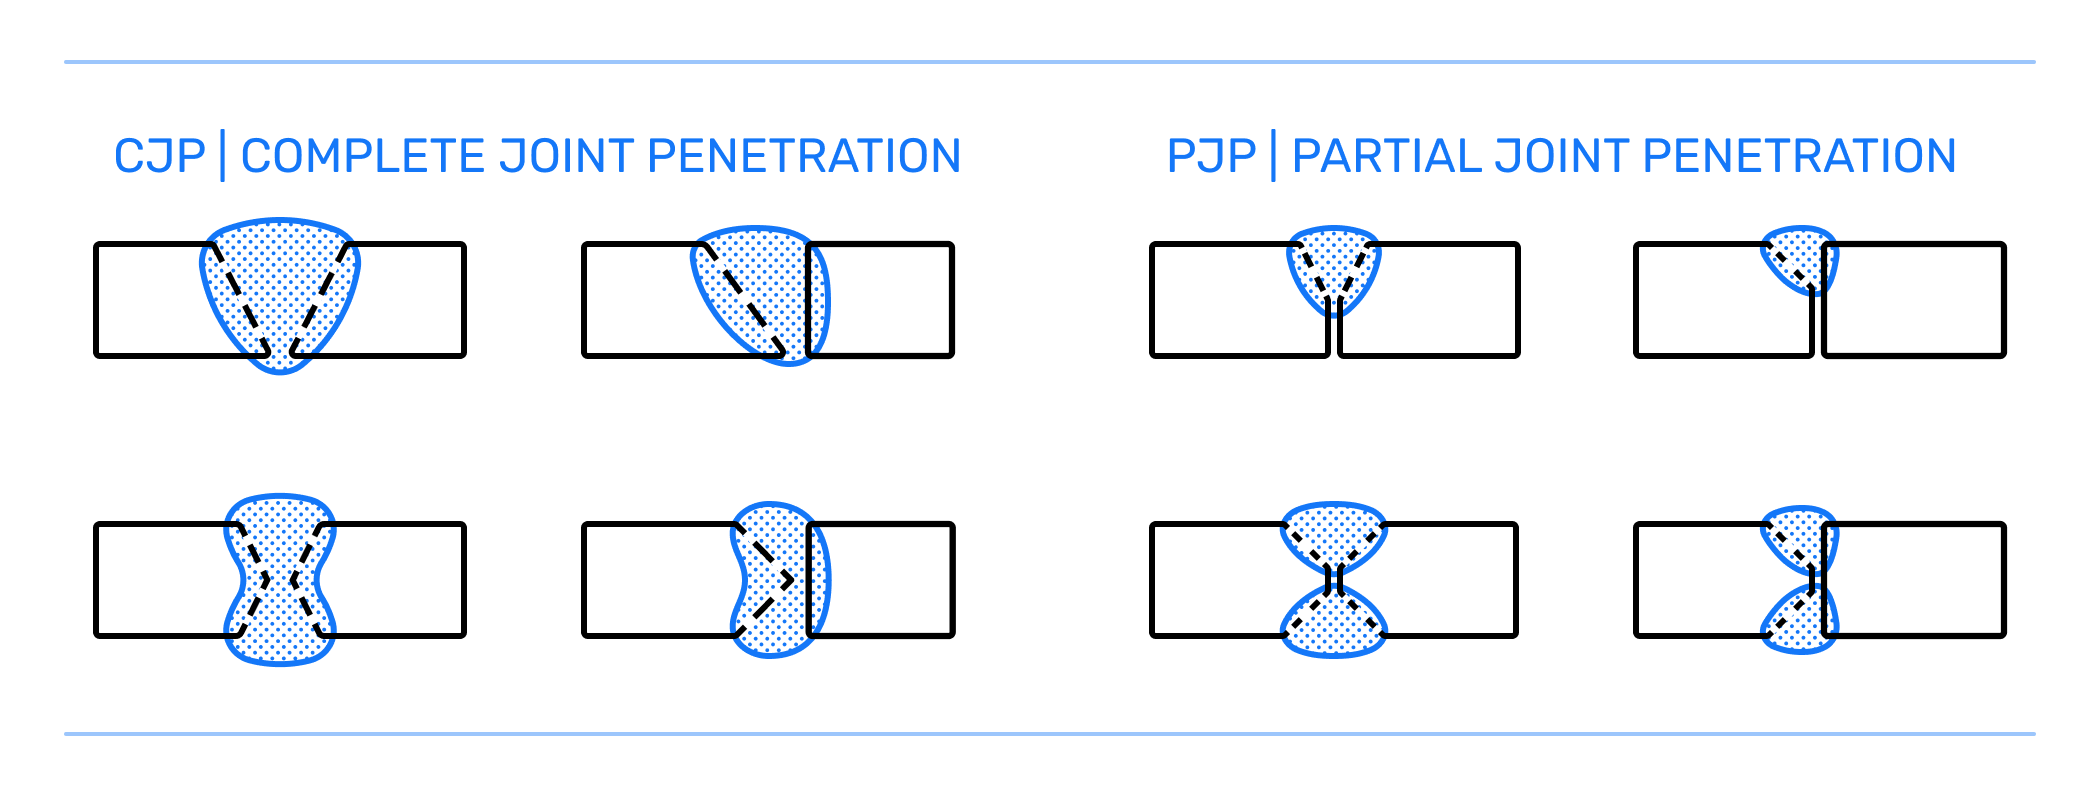 CJP Complete Joint Penetration PJP Partial Joint Penetration Welding